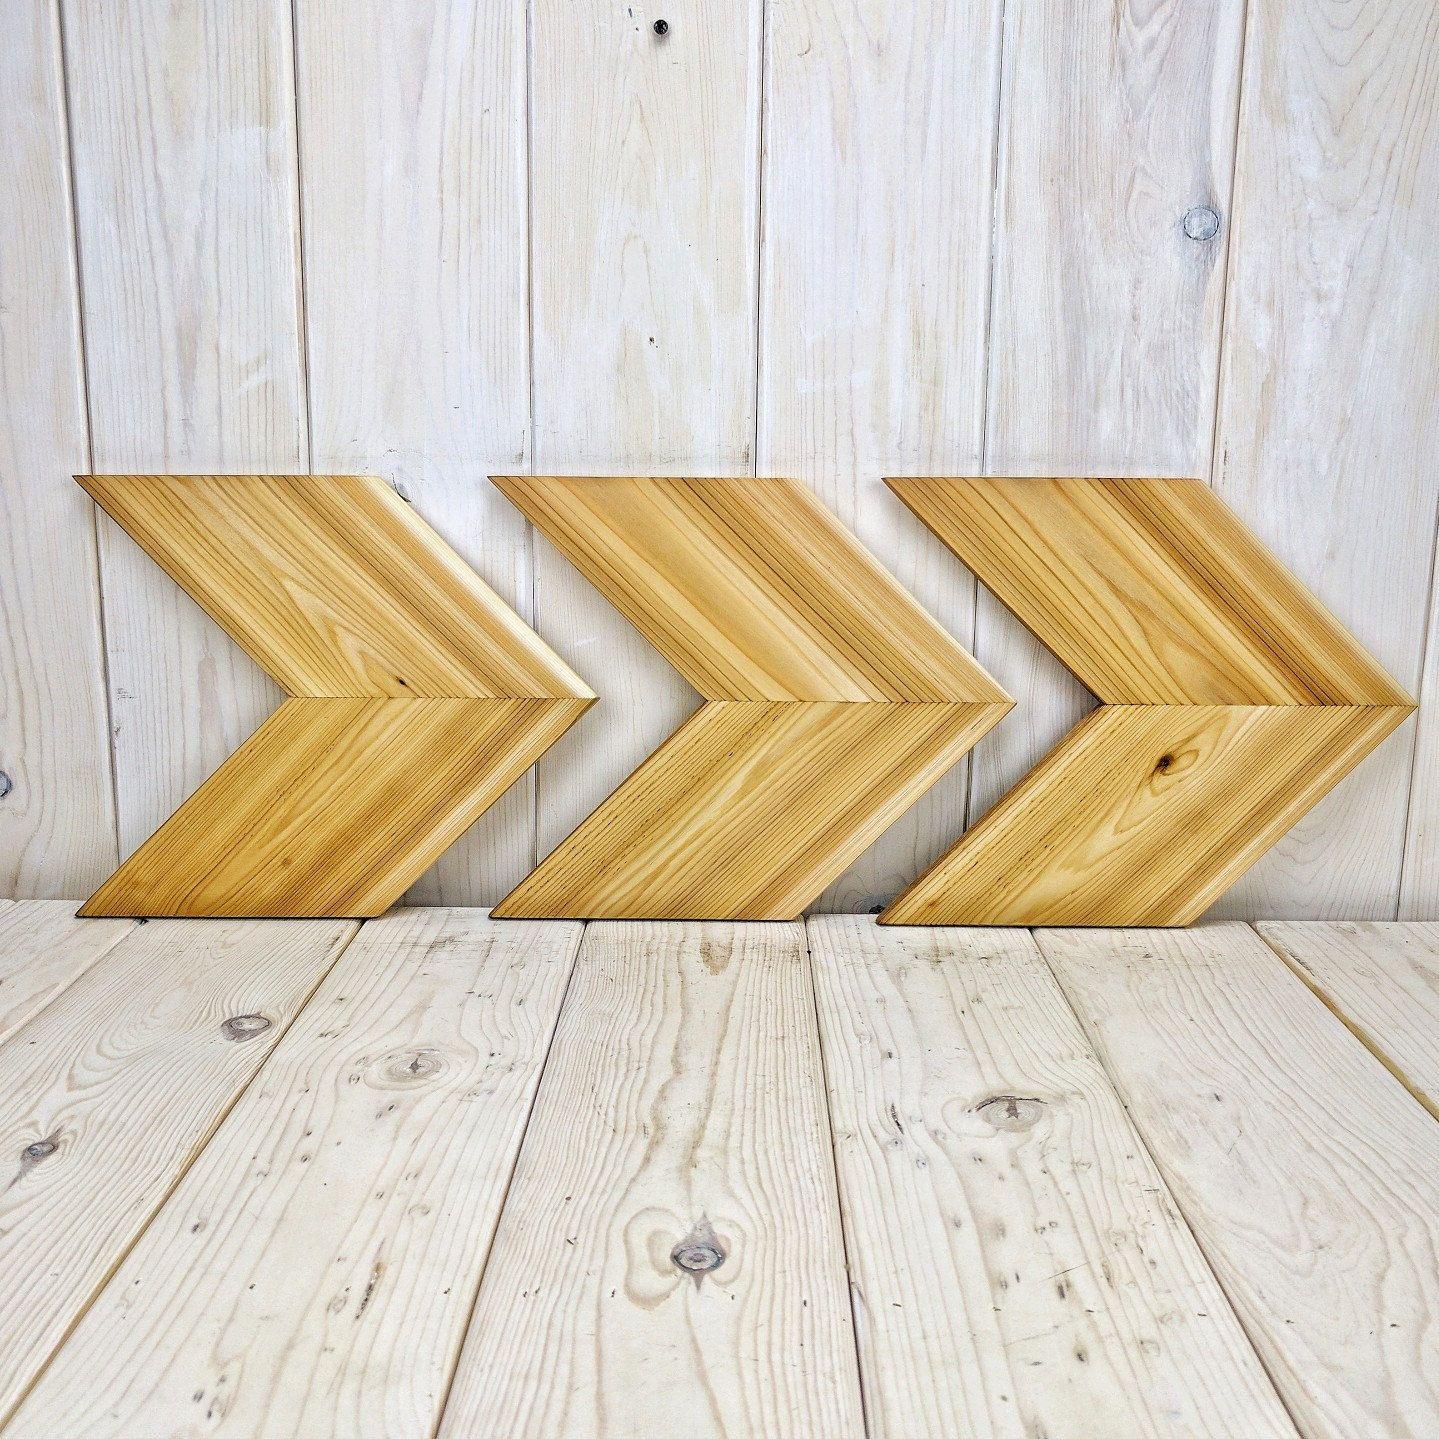 Luxury Rustic Wood Arrow Wall Decor Mold - The Wall Art Decorations ...